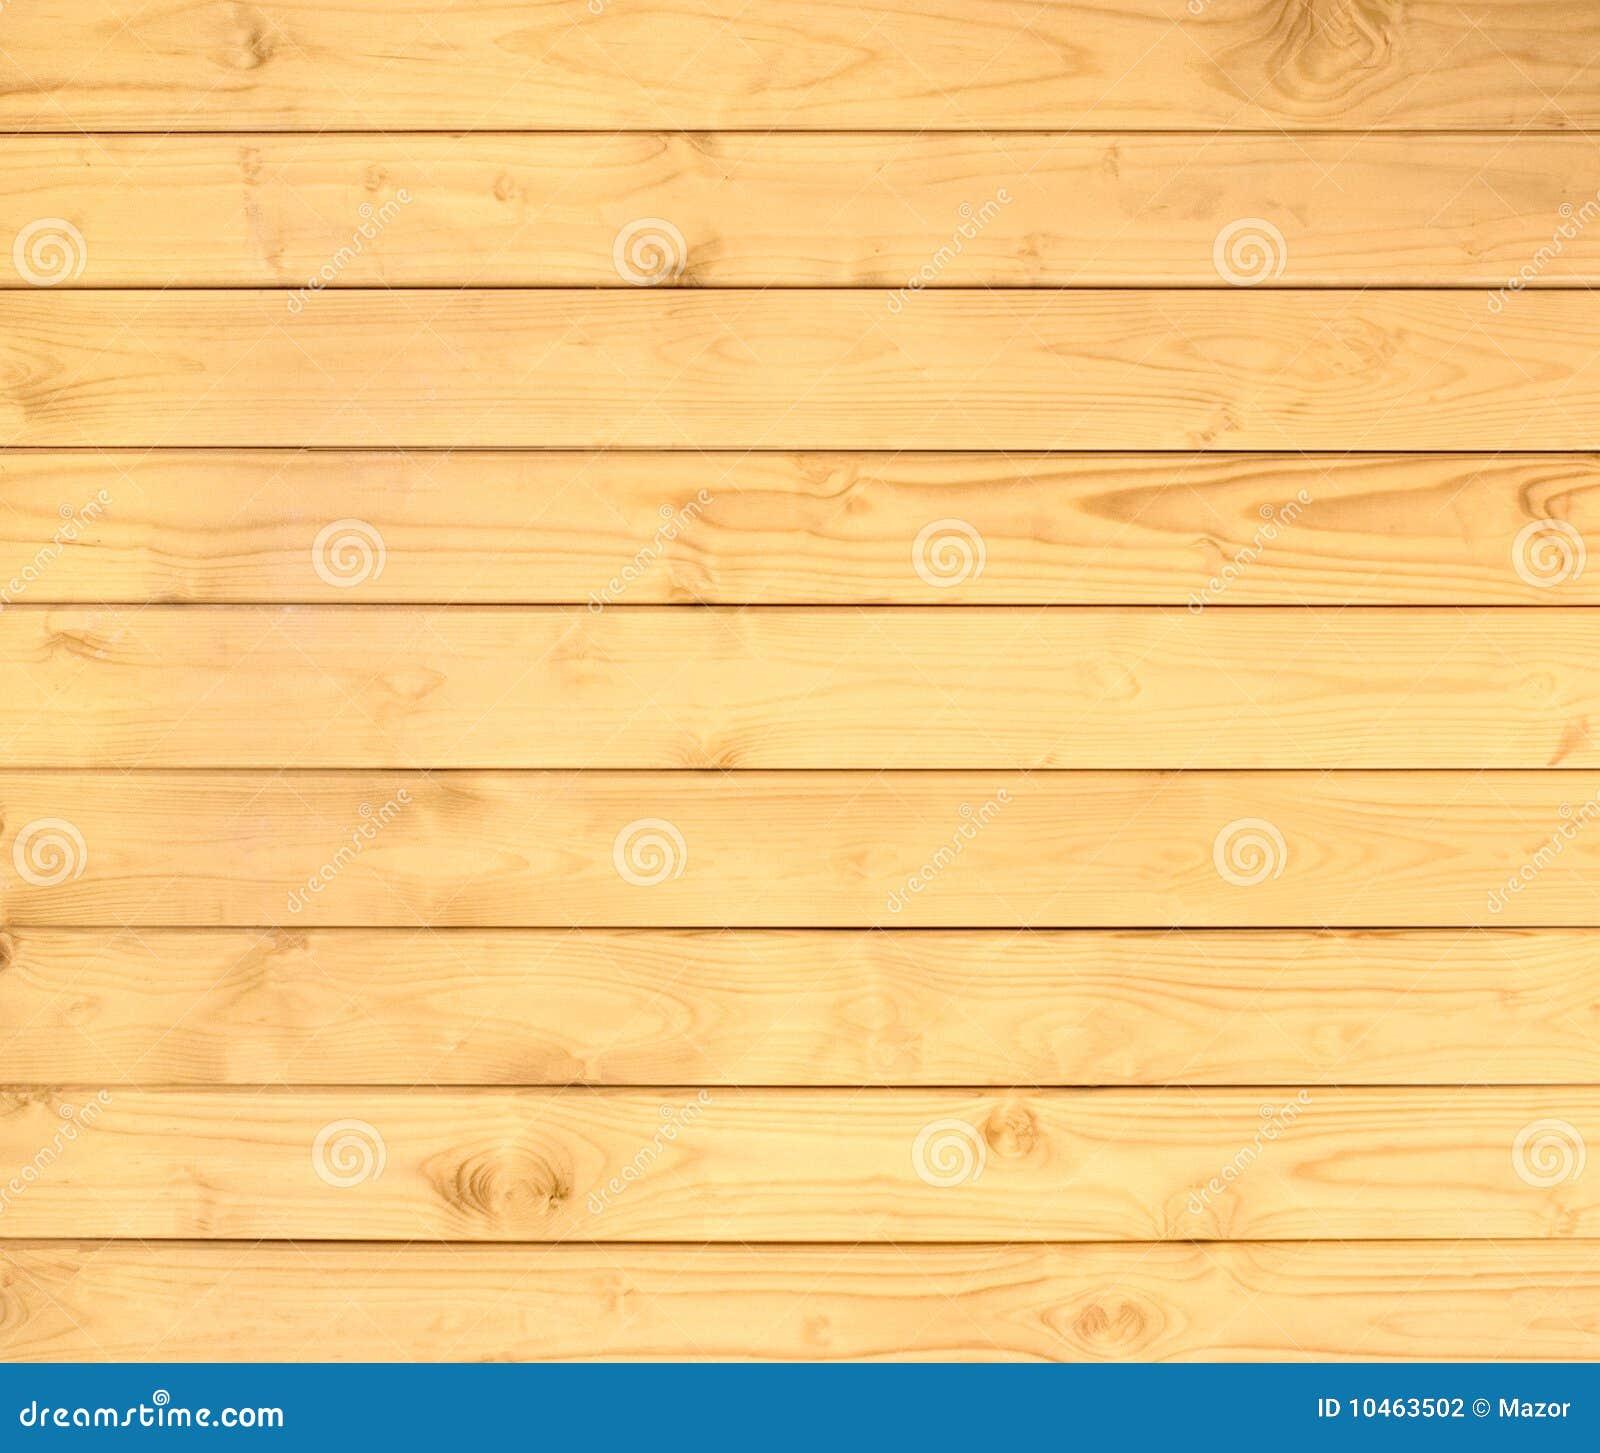 Le bois embarque la texture